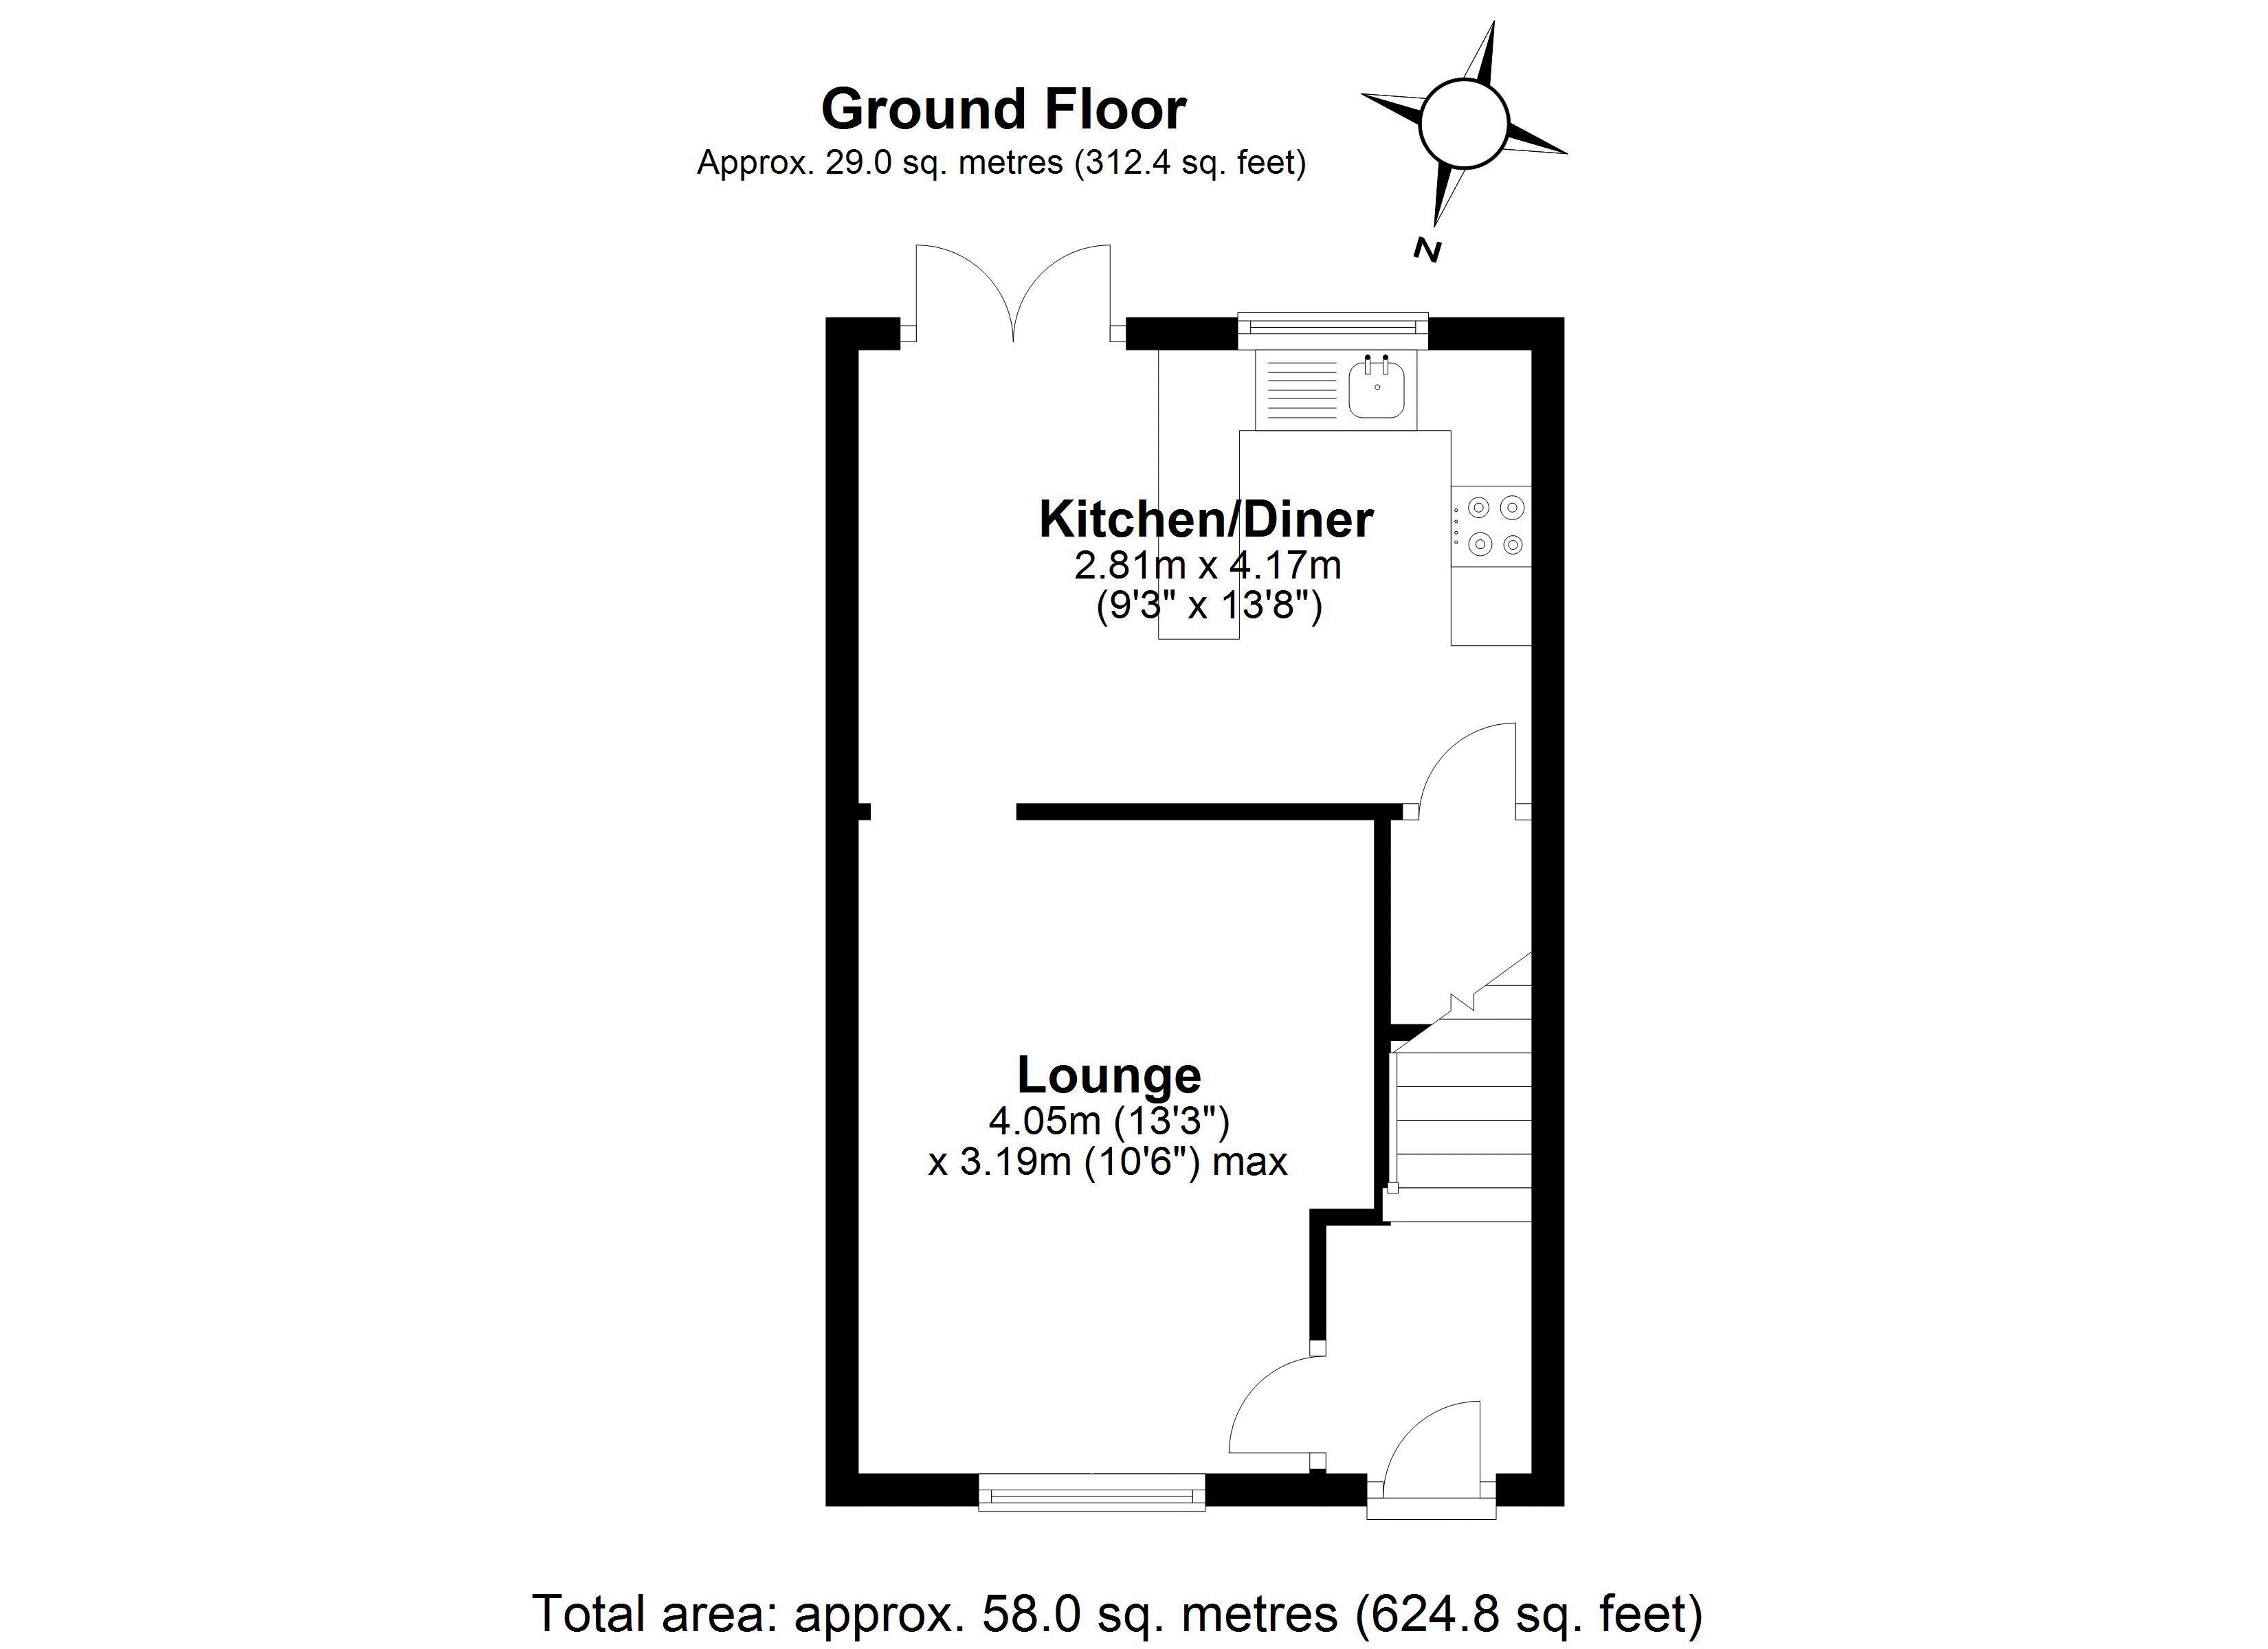 Redwood ground floor plan